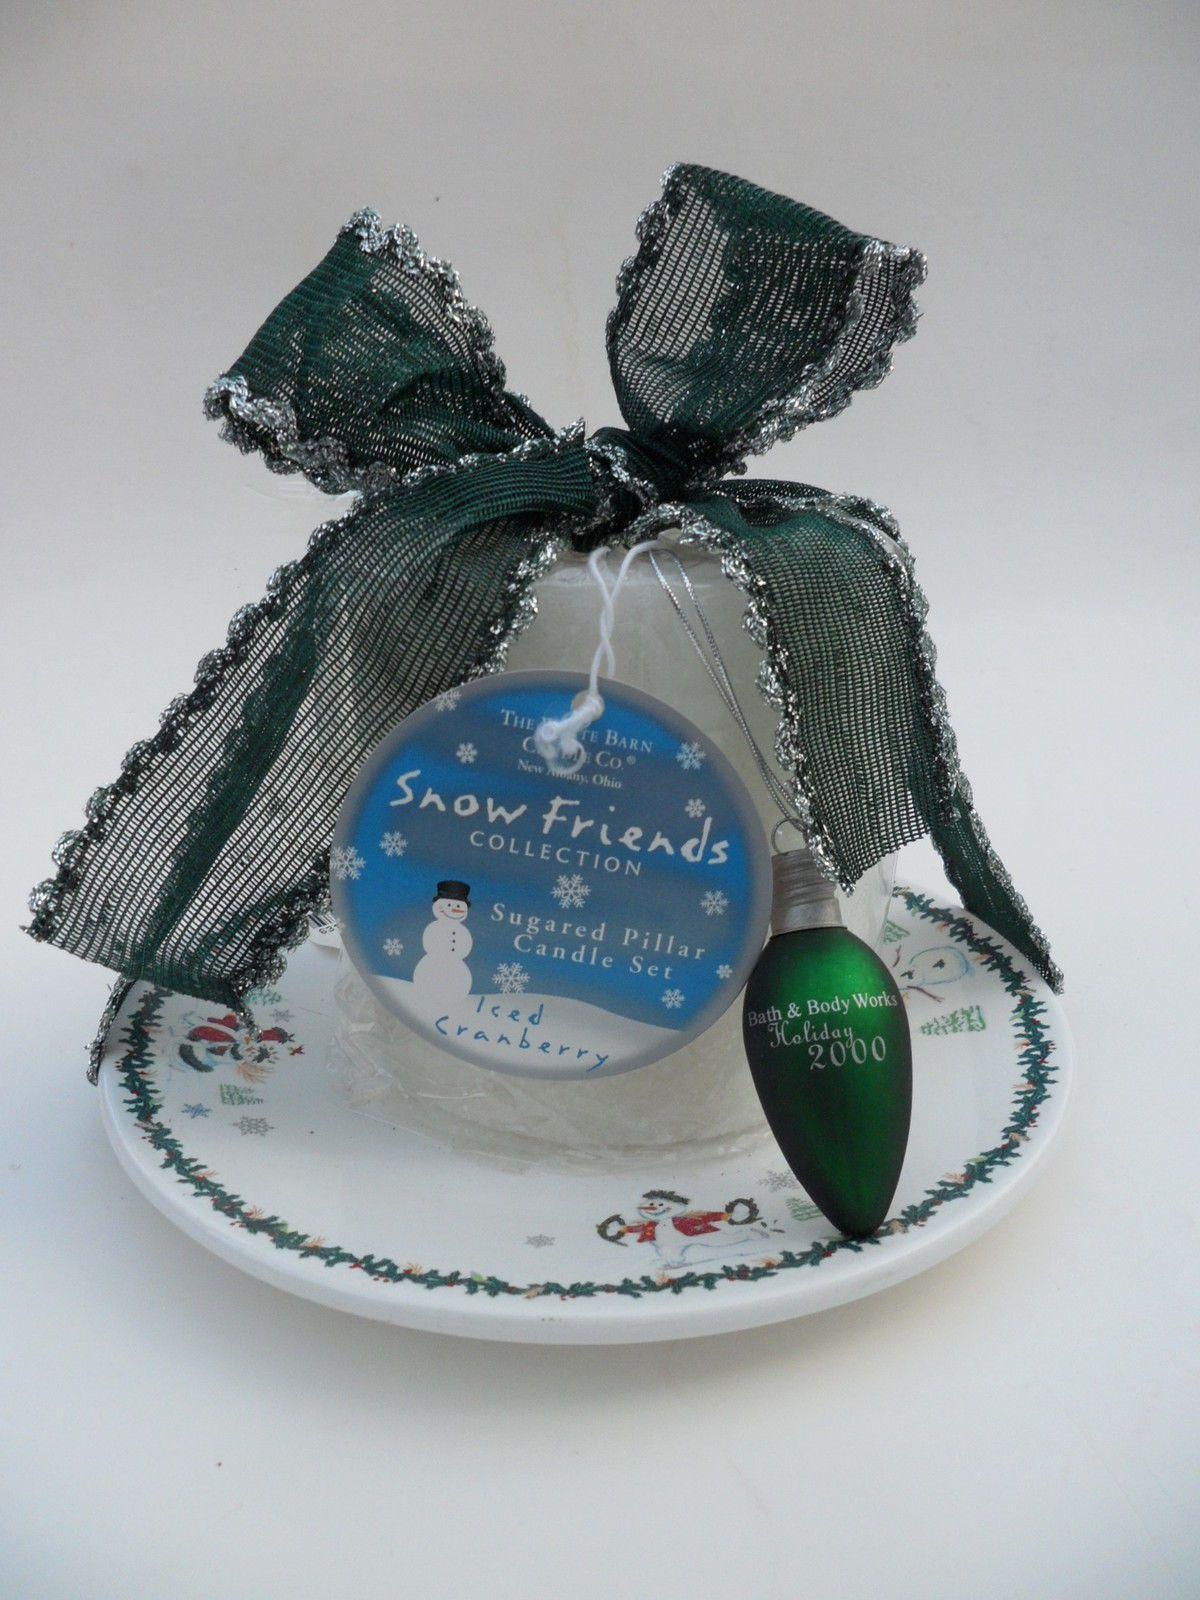 White Barn Candle Co. | eBay! | Candles, White barn ...